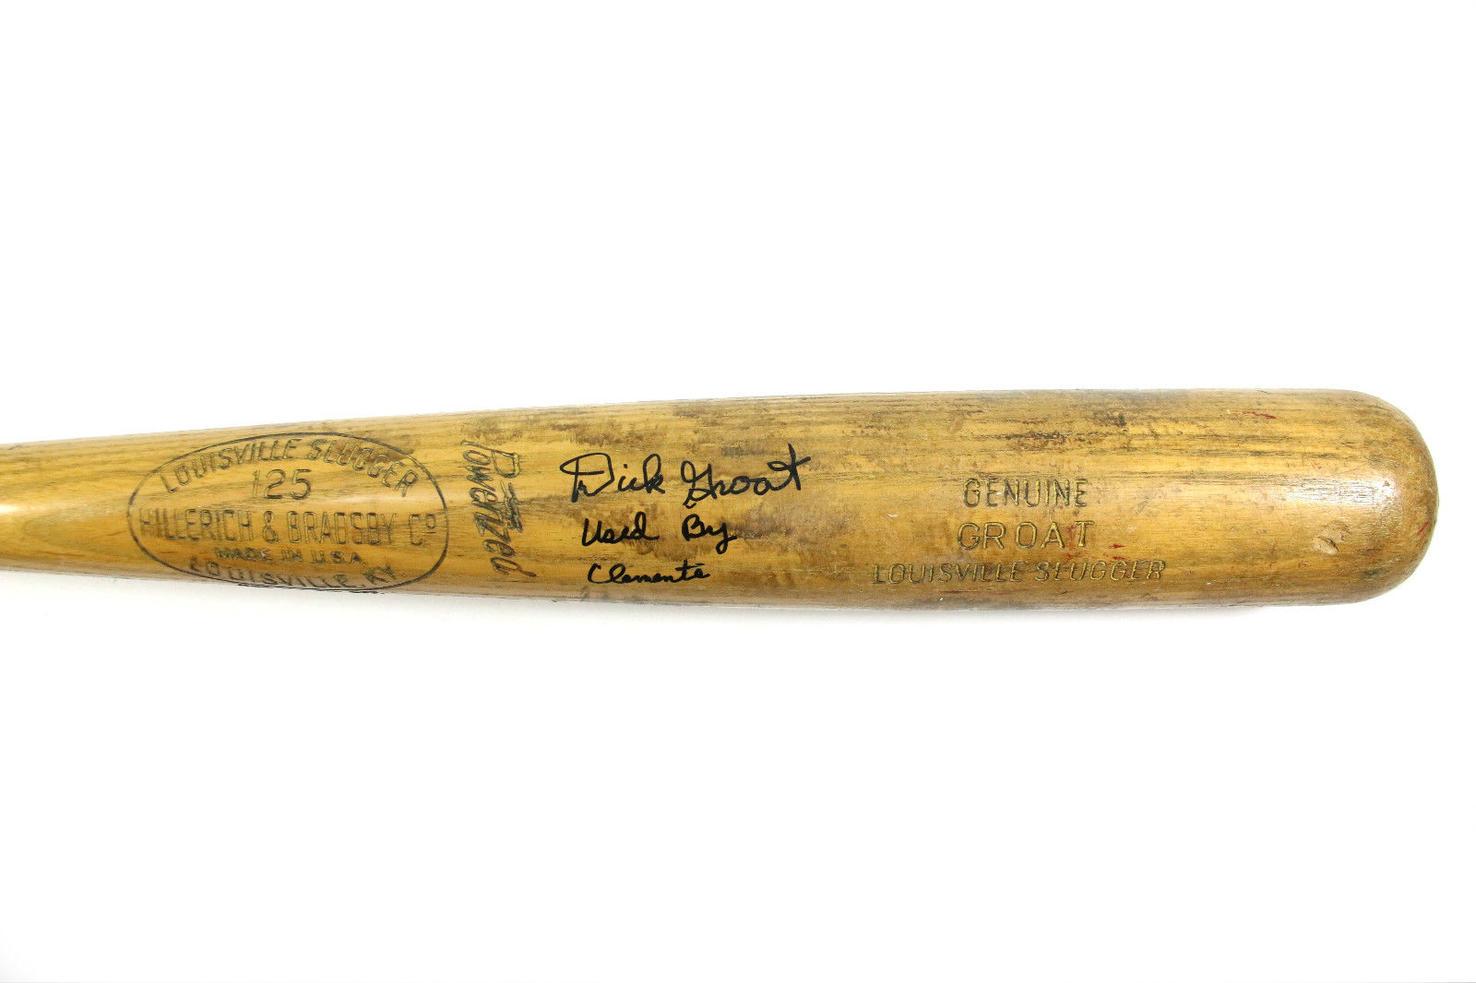 Name:  ROBERTO CLEMENTE DICK GROAT trademark barrel block letter GROAT area  bat 1961-62 GAME USED PITT.jpg Views: 123 Size:  93.2 KB